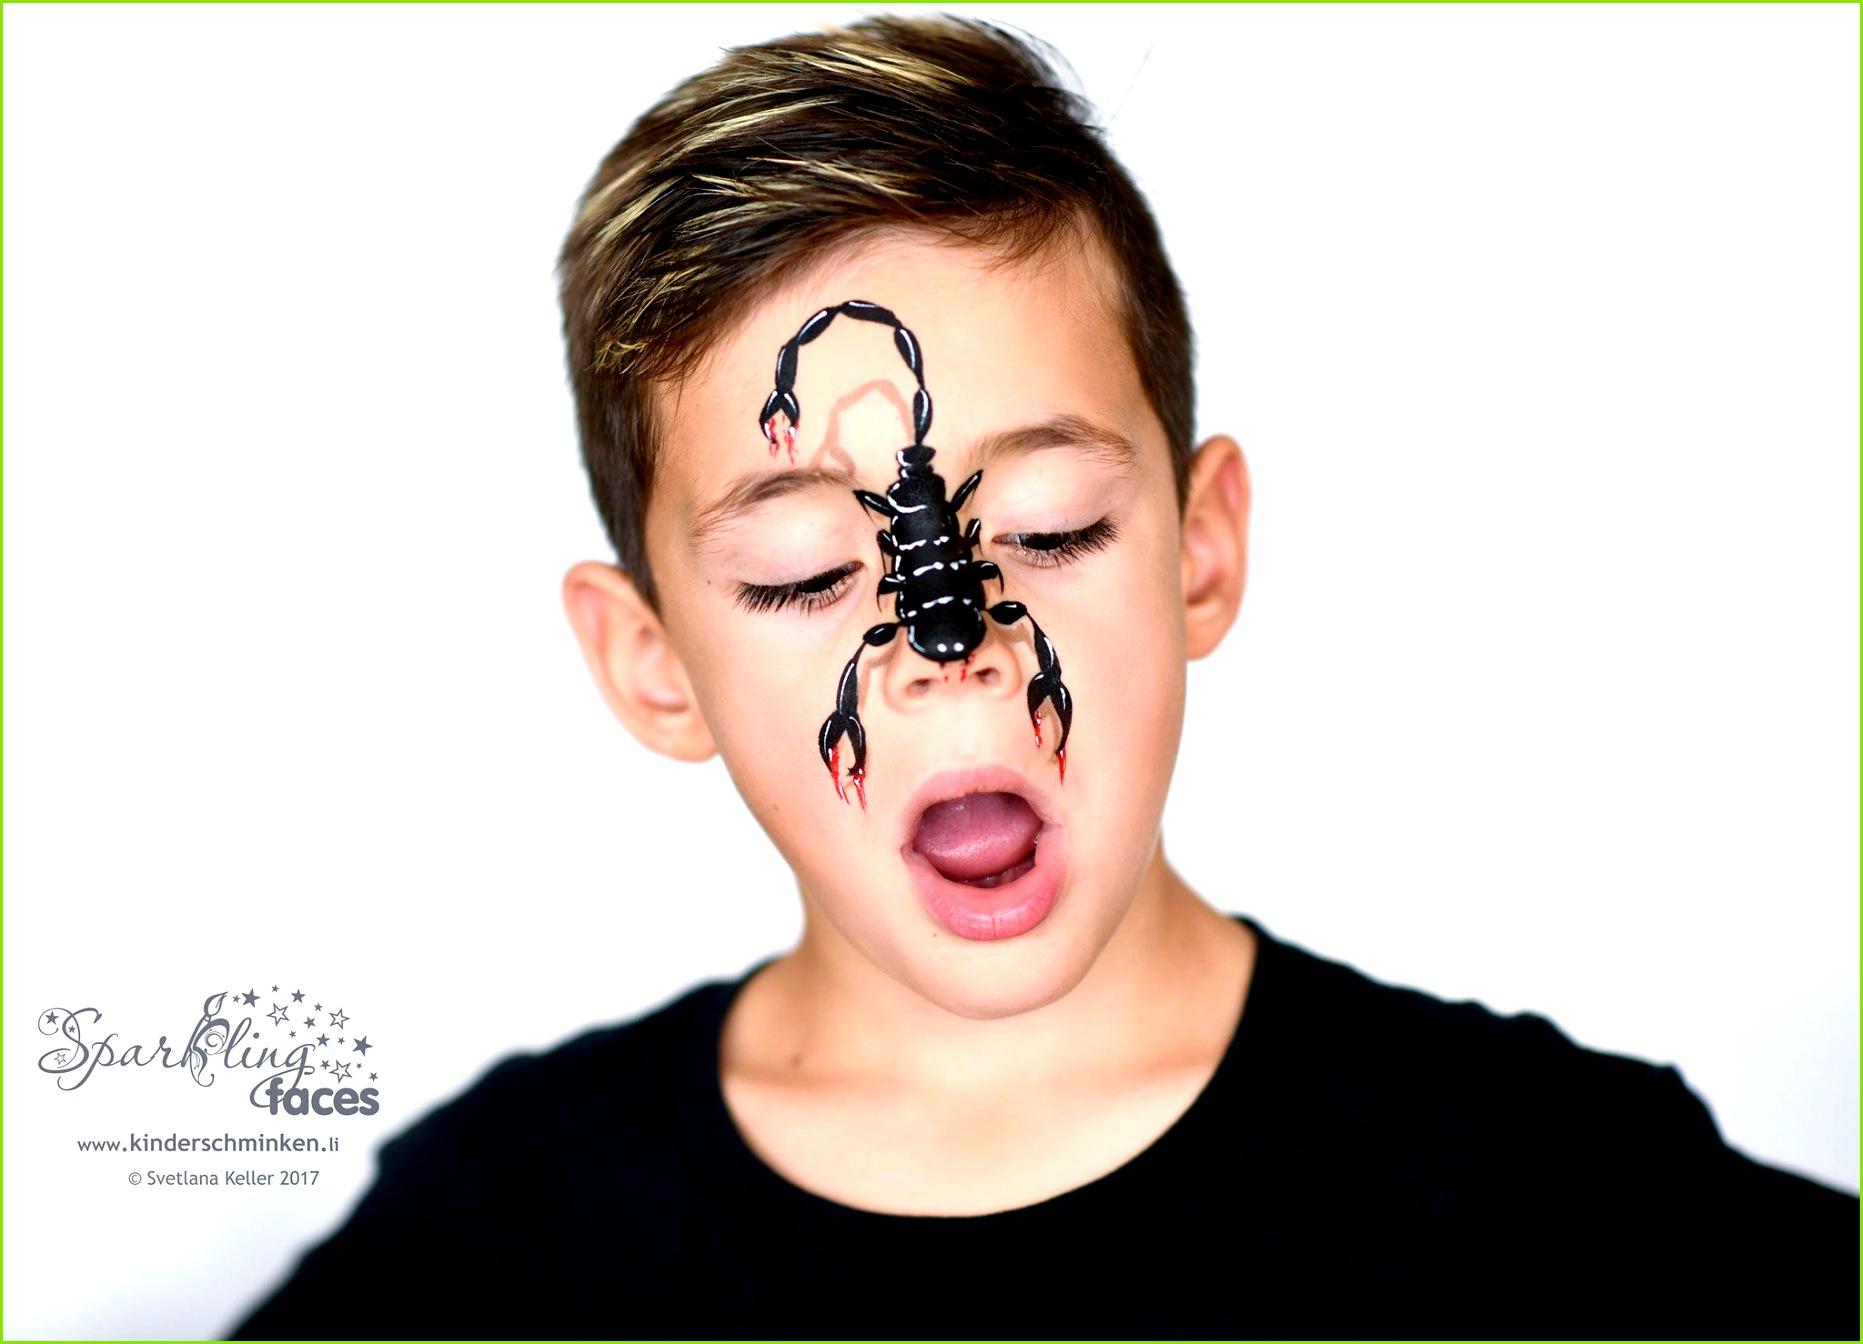 Kinderschminken Kinderschminken Vorlagen Schminkfarben kaufen Kinderschminken Kurse Schminkfarben Schweiz Airbrush Tattoos